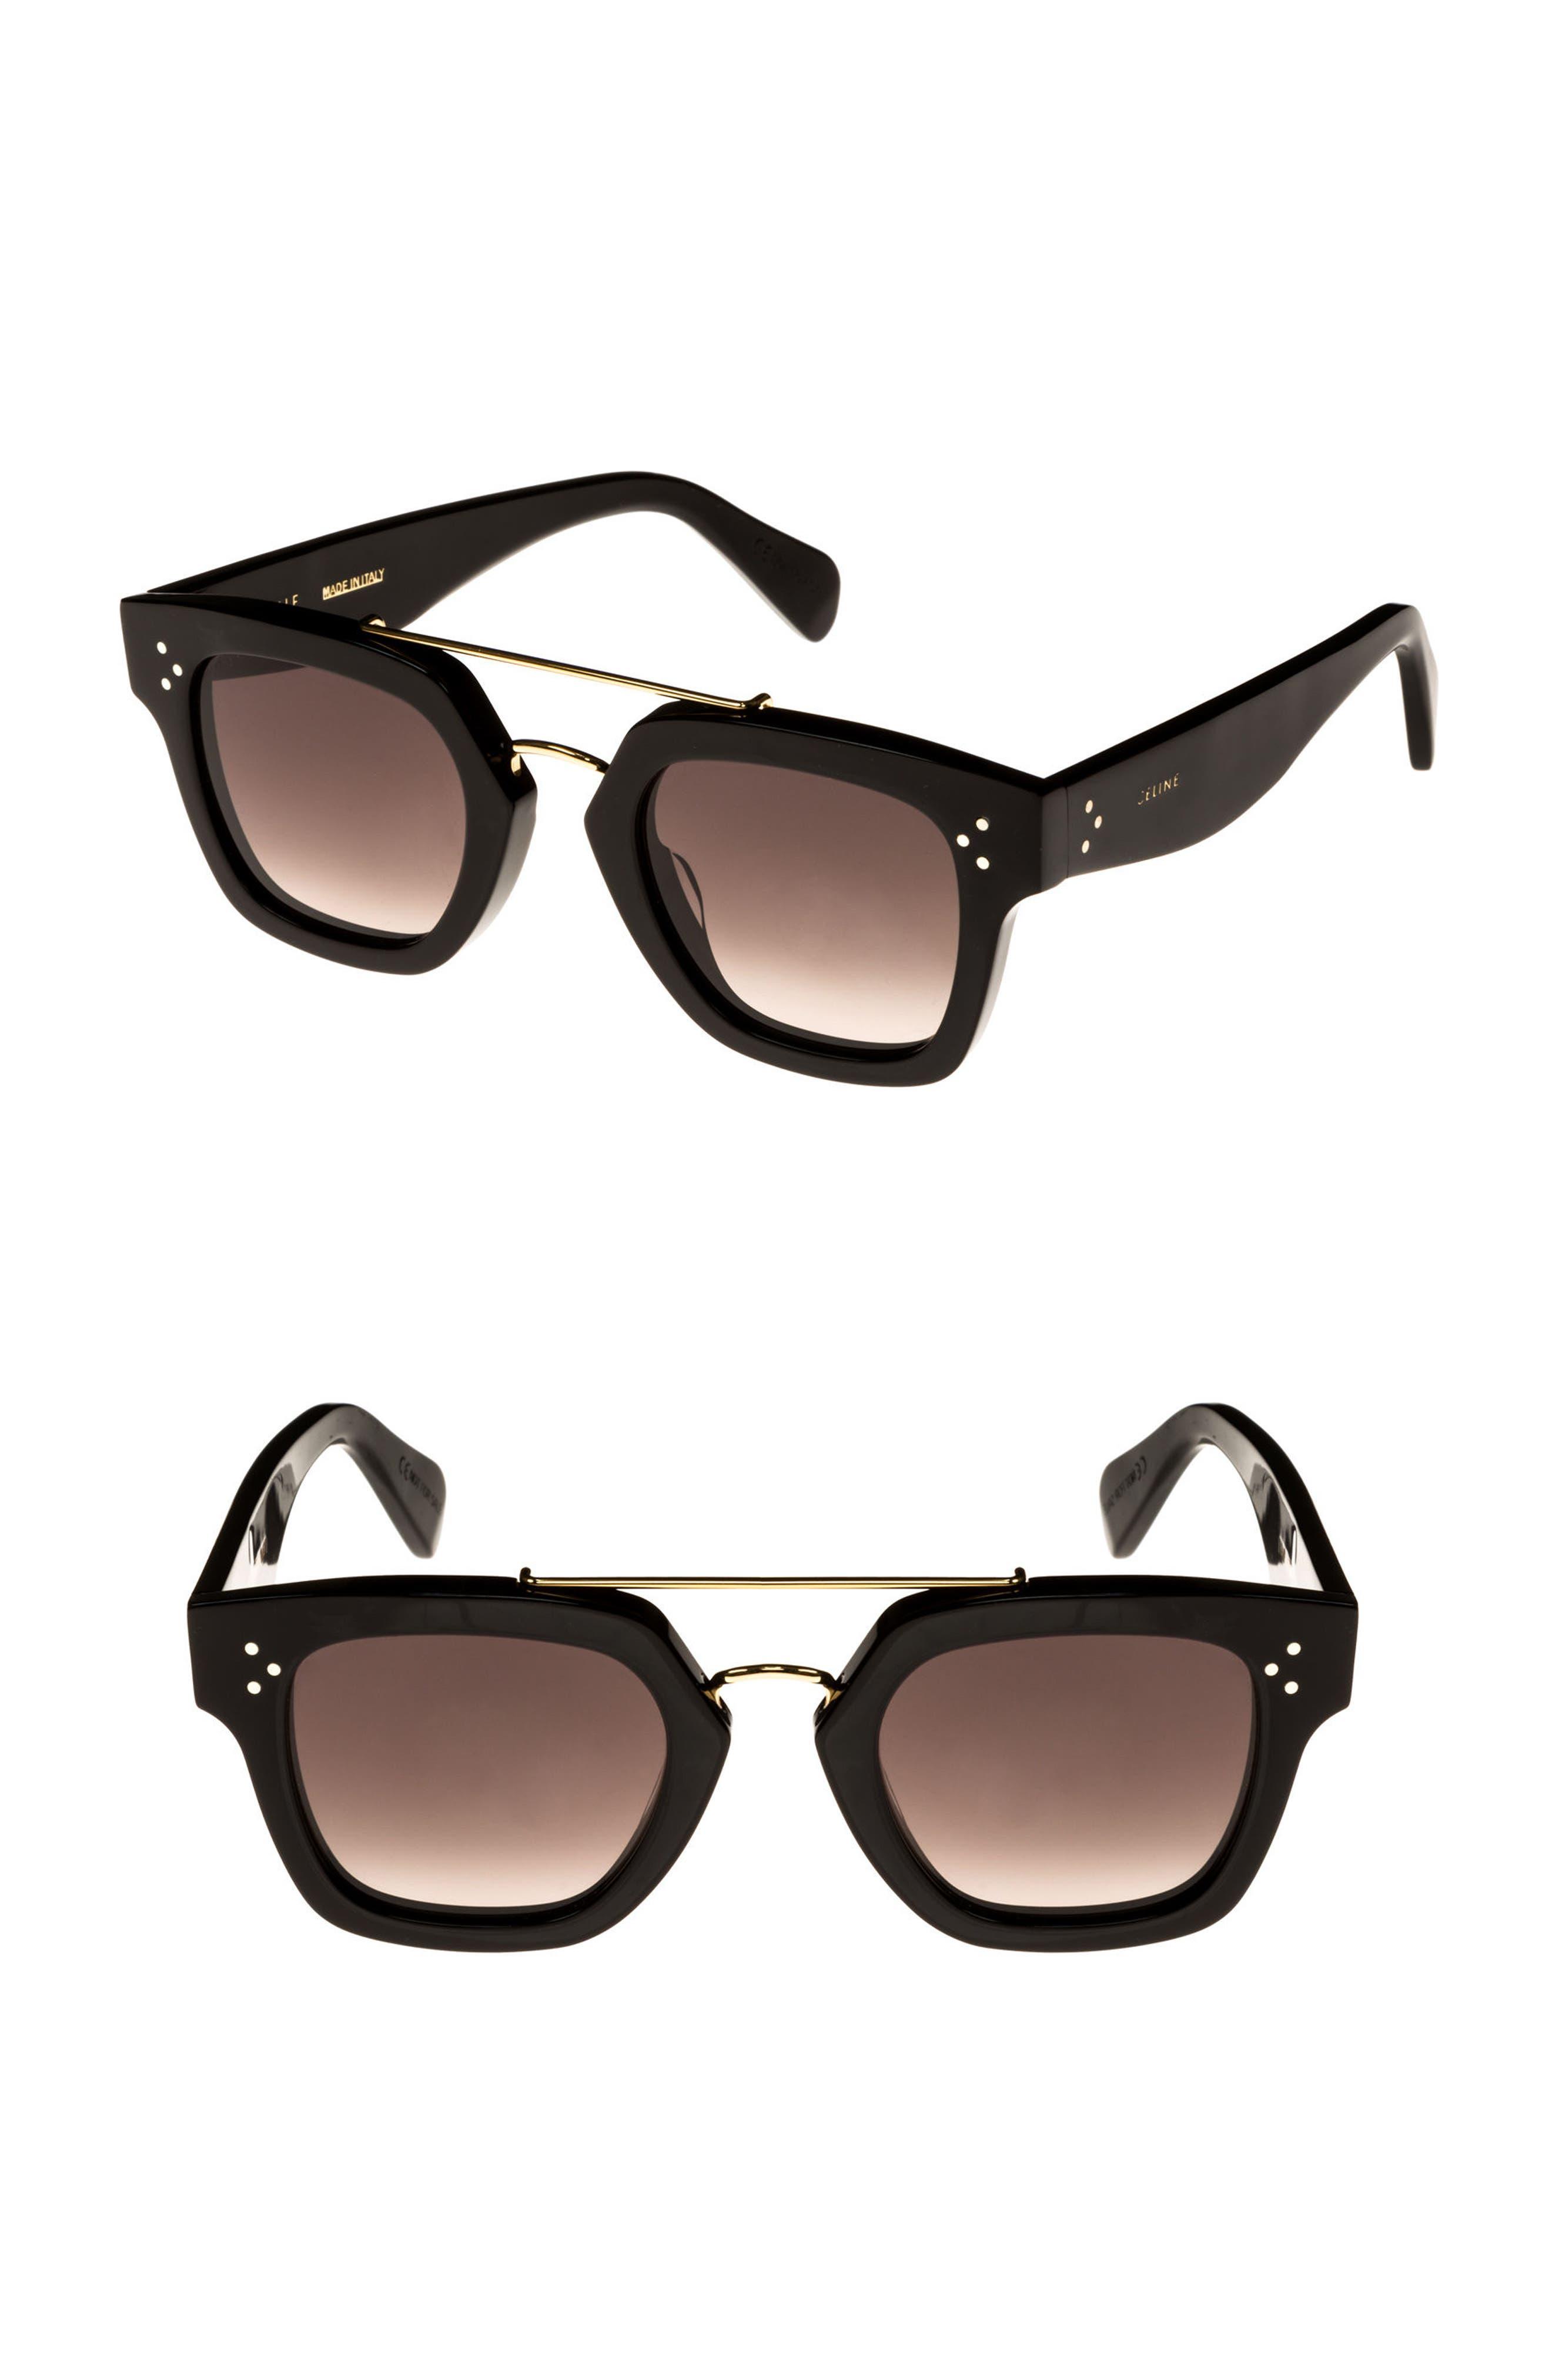 47mm Gradient Square Sunglasses,                             Main thumbnail 1, color,                             001